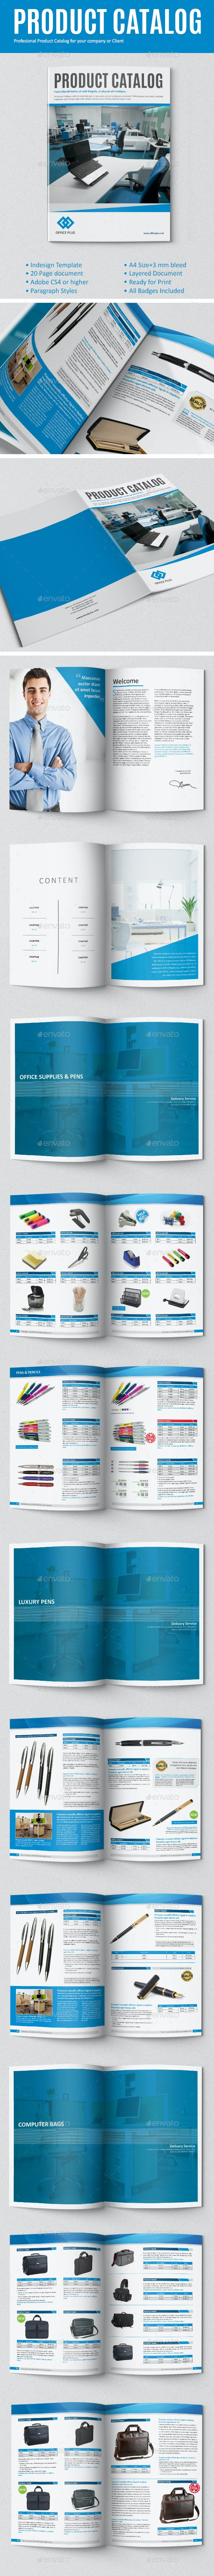 Product Catalog - Brochures Print Templates